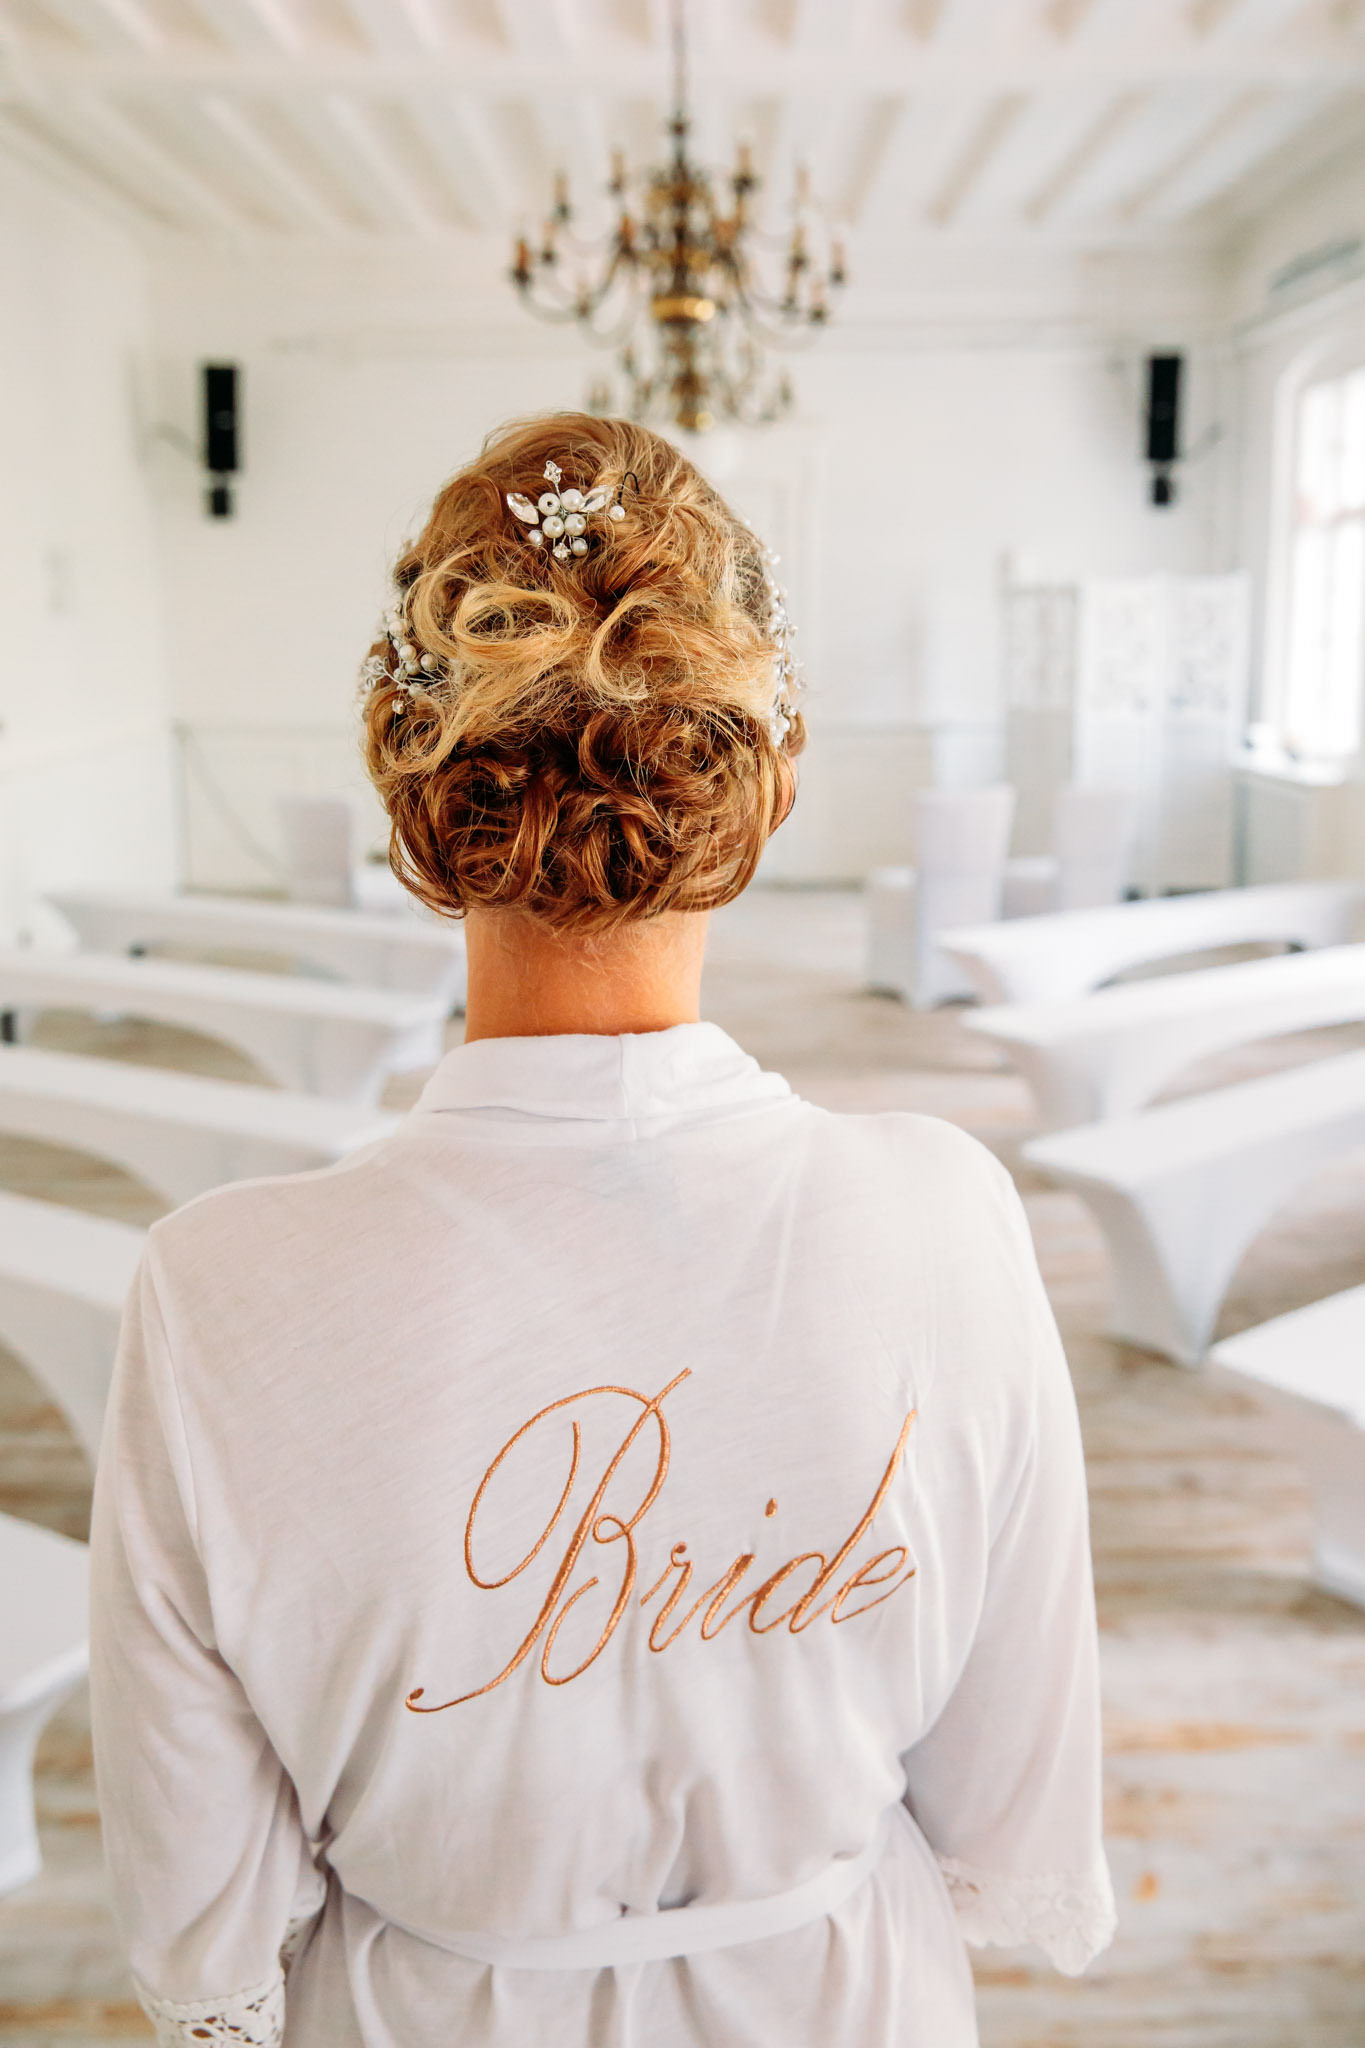 180818_Hochzeit_german_american_grunewald_berlin_locanda_12_apostoli_wedding_web_0002.jpg